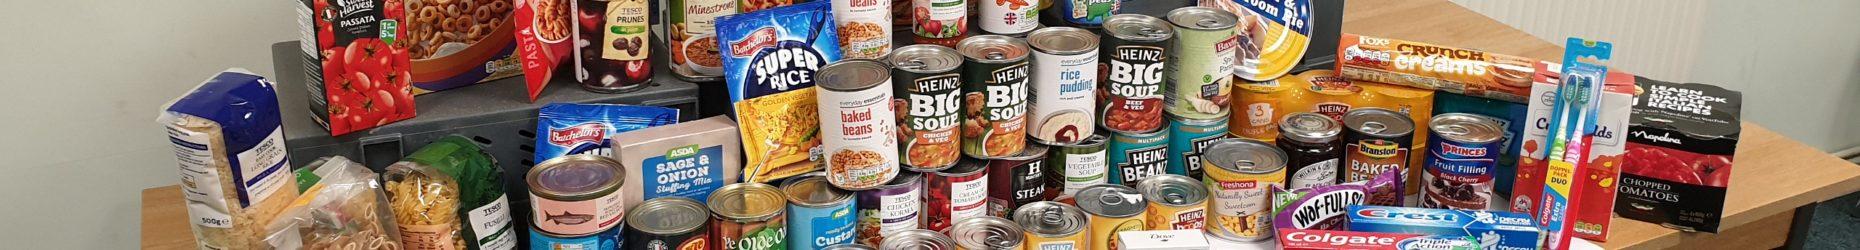 Foodstuffs donation